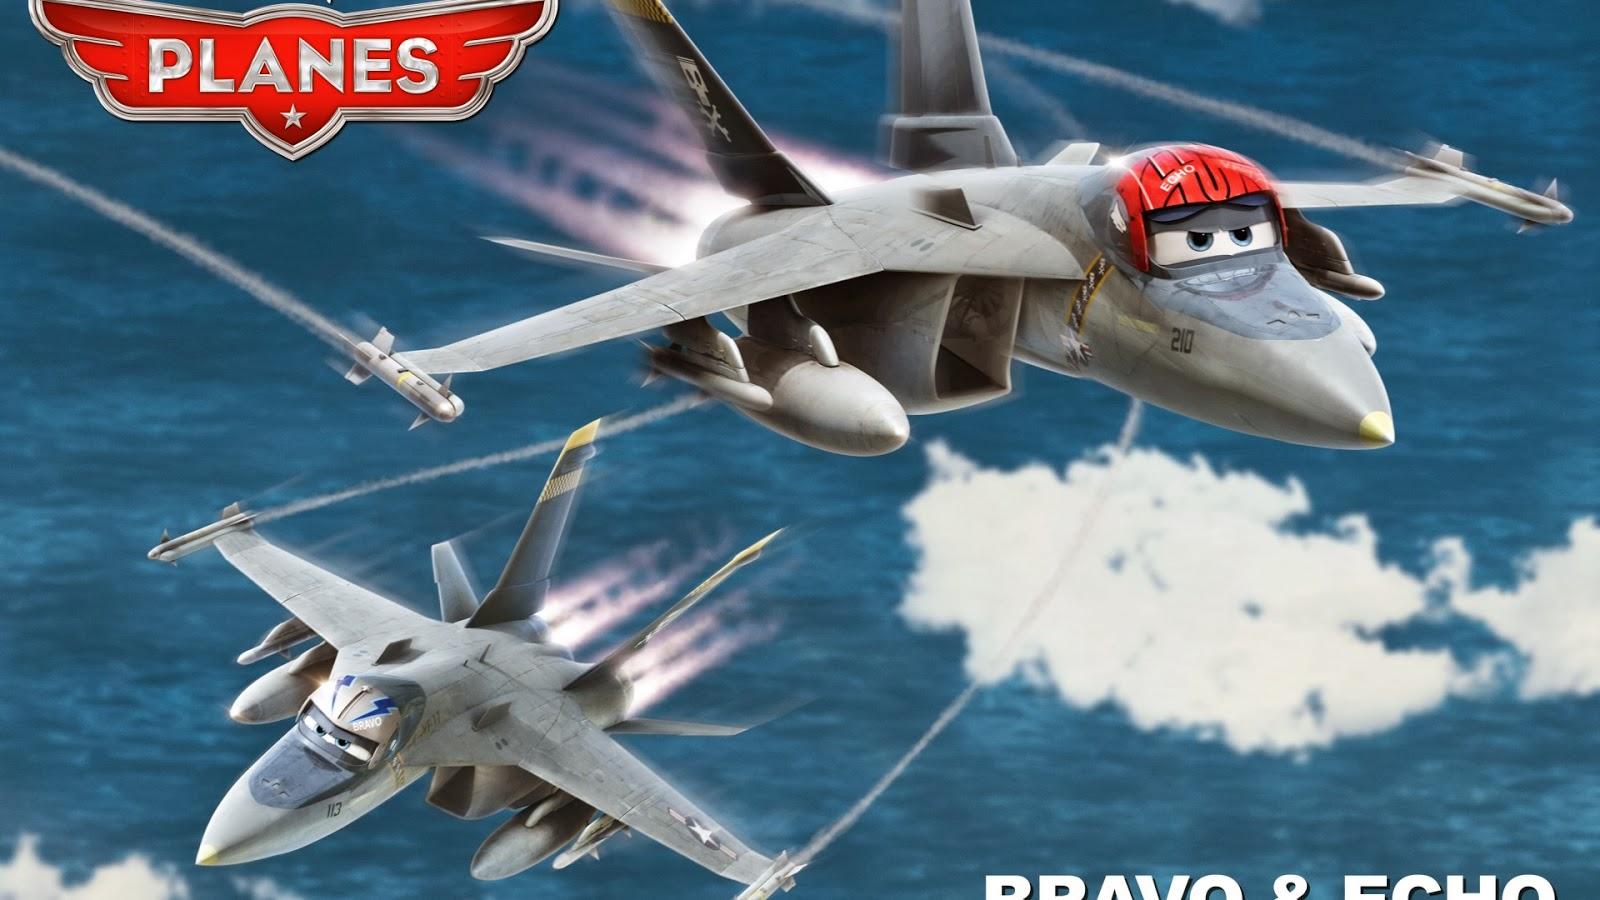 disney planes movie wallpapers - photo #16